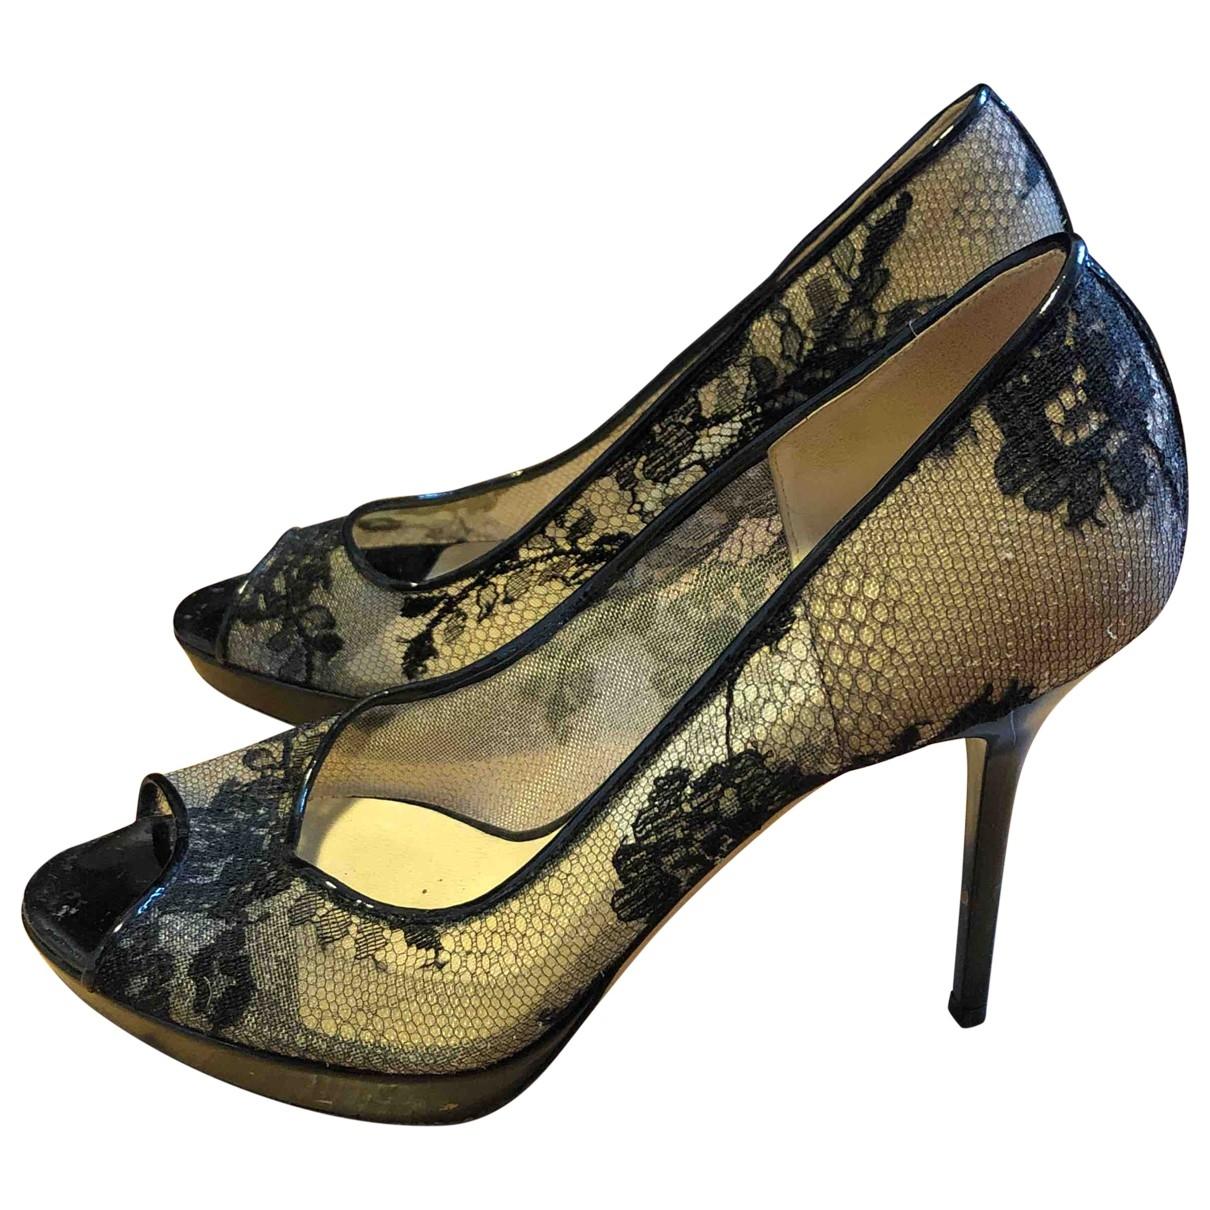 Jimmy Choo \N Black Patent leather Heels for Women 36 EU